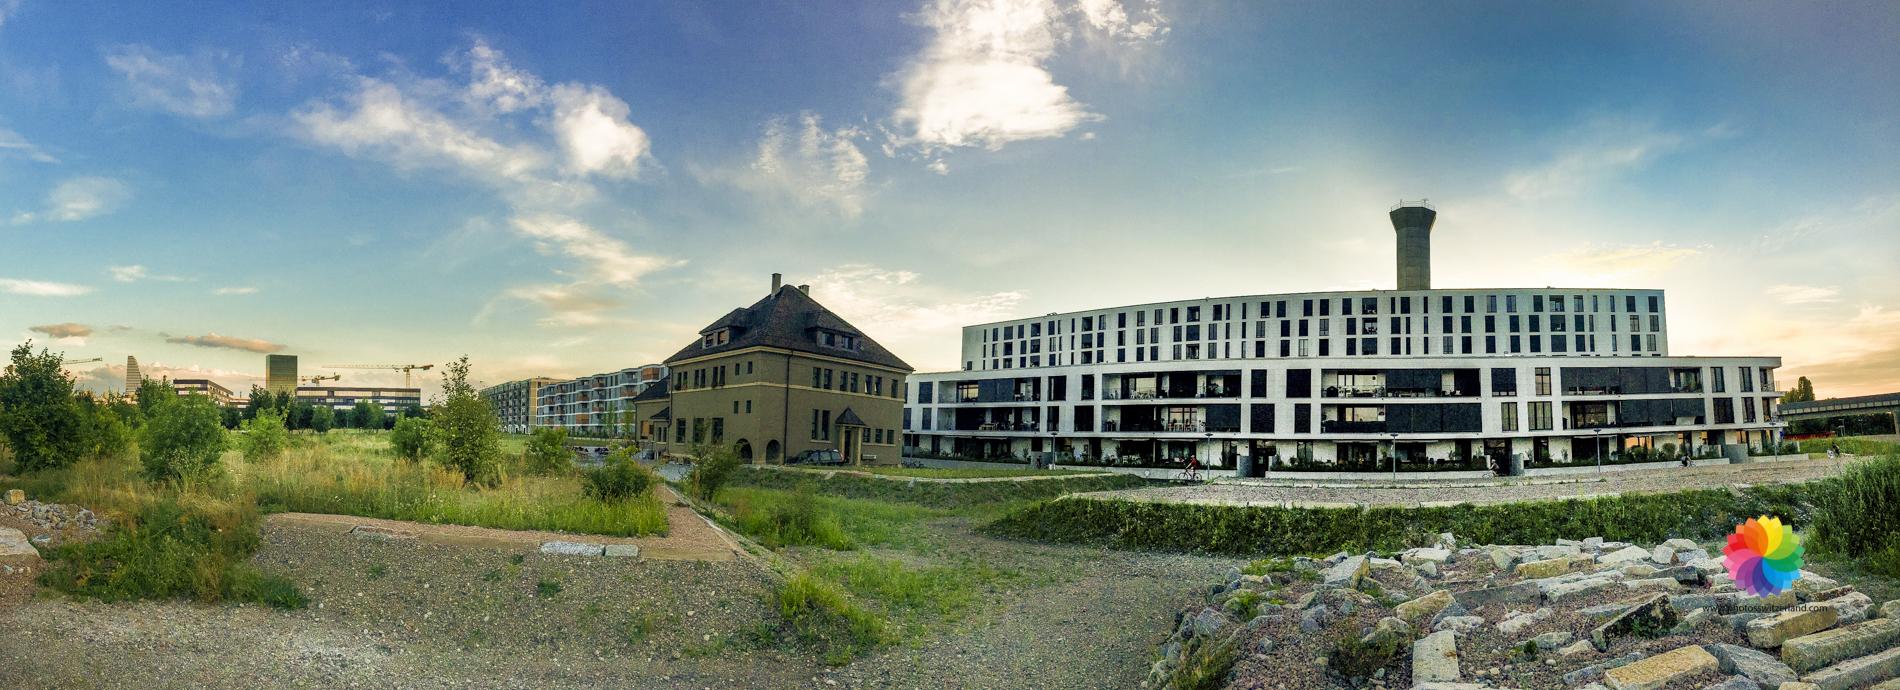 Photosswitzerland Erlenmatt